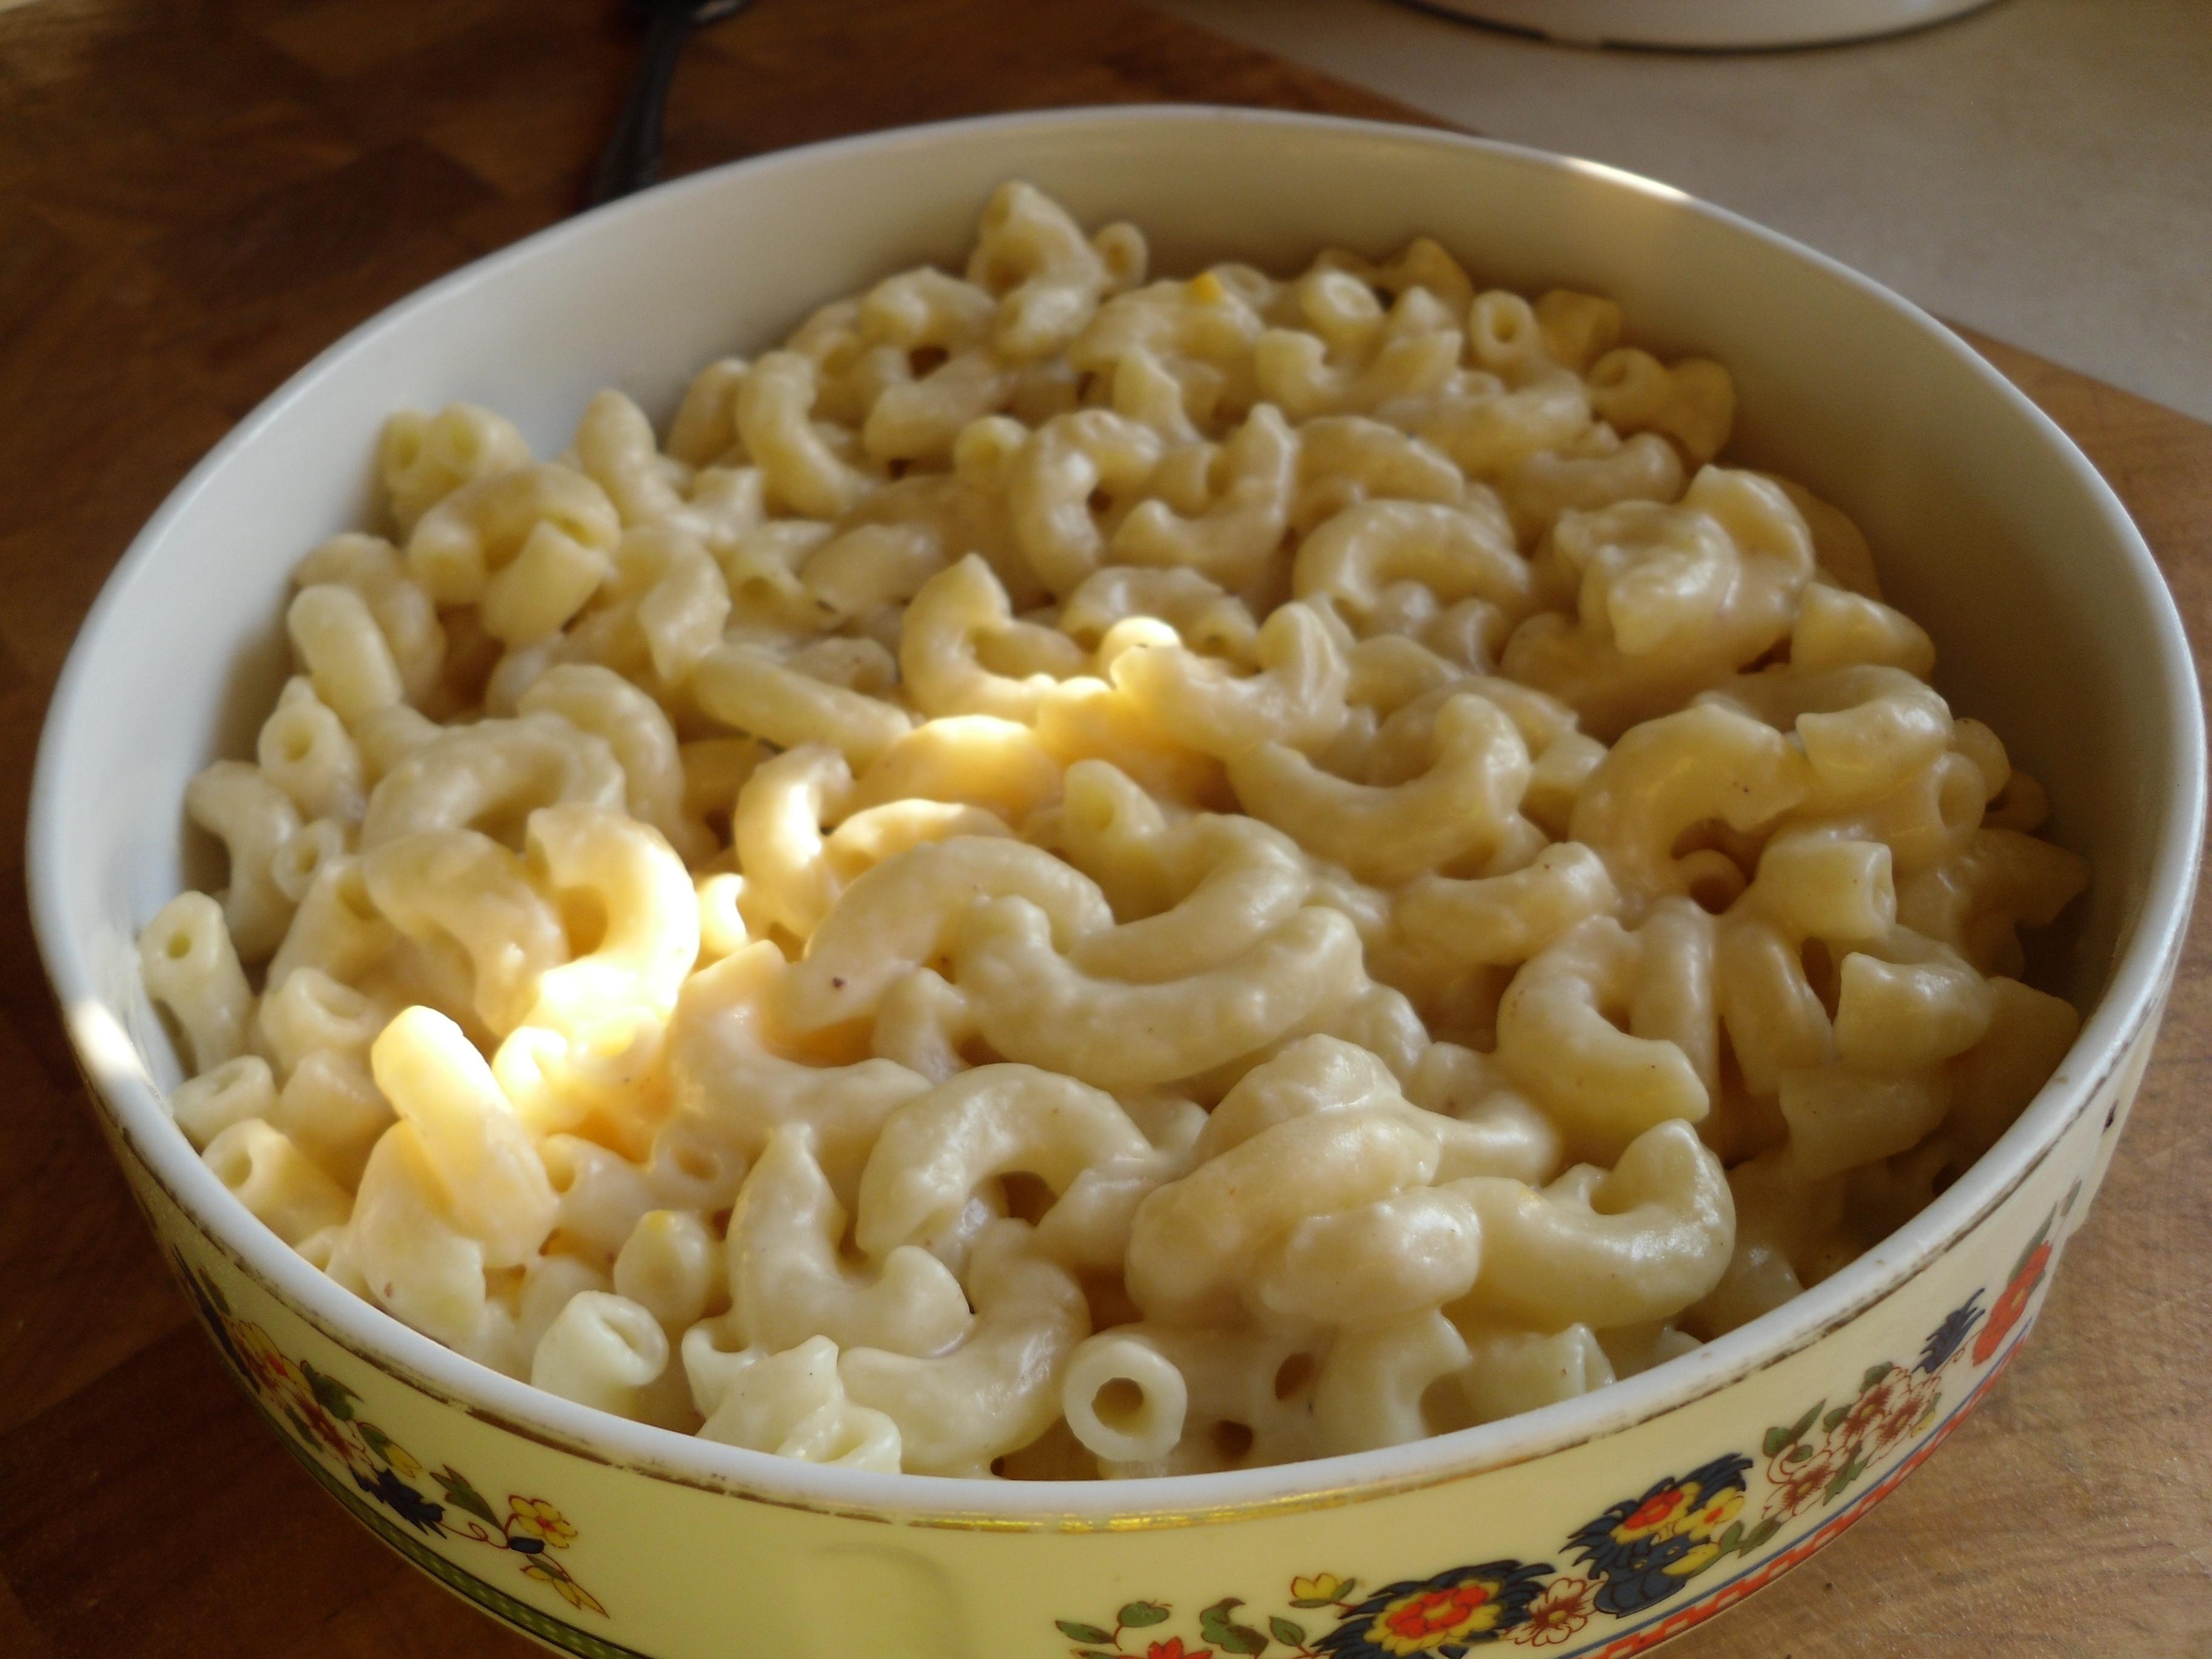 Picture of Making Macaroni